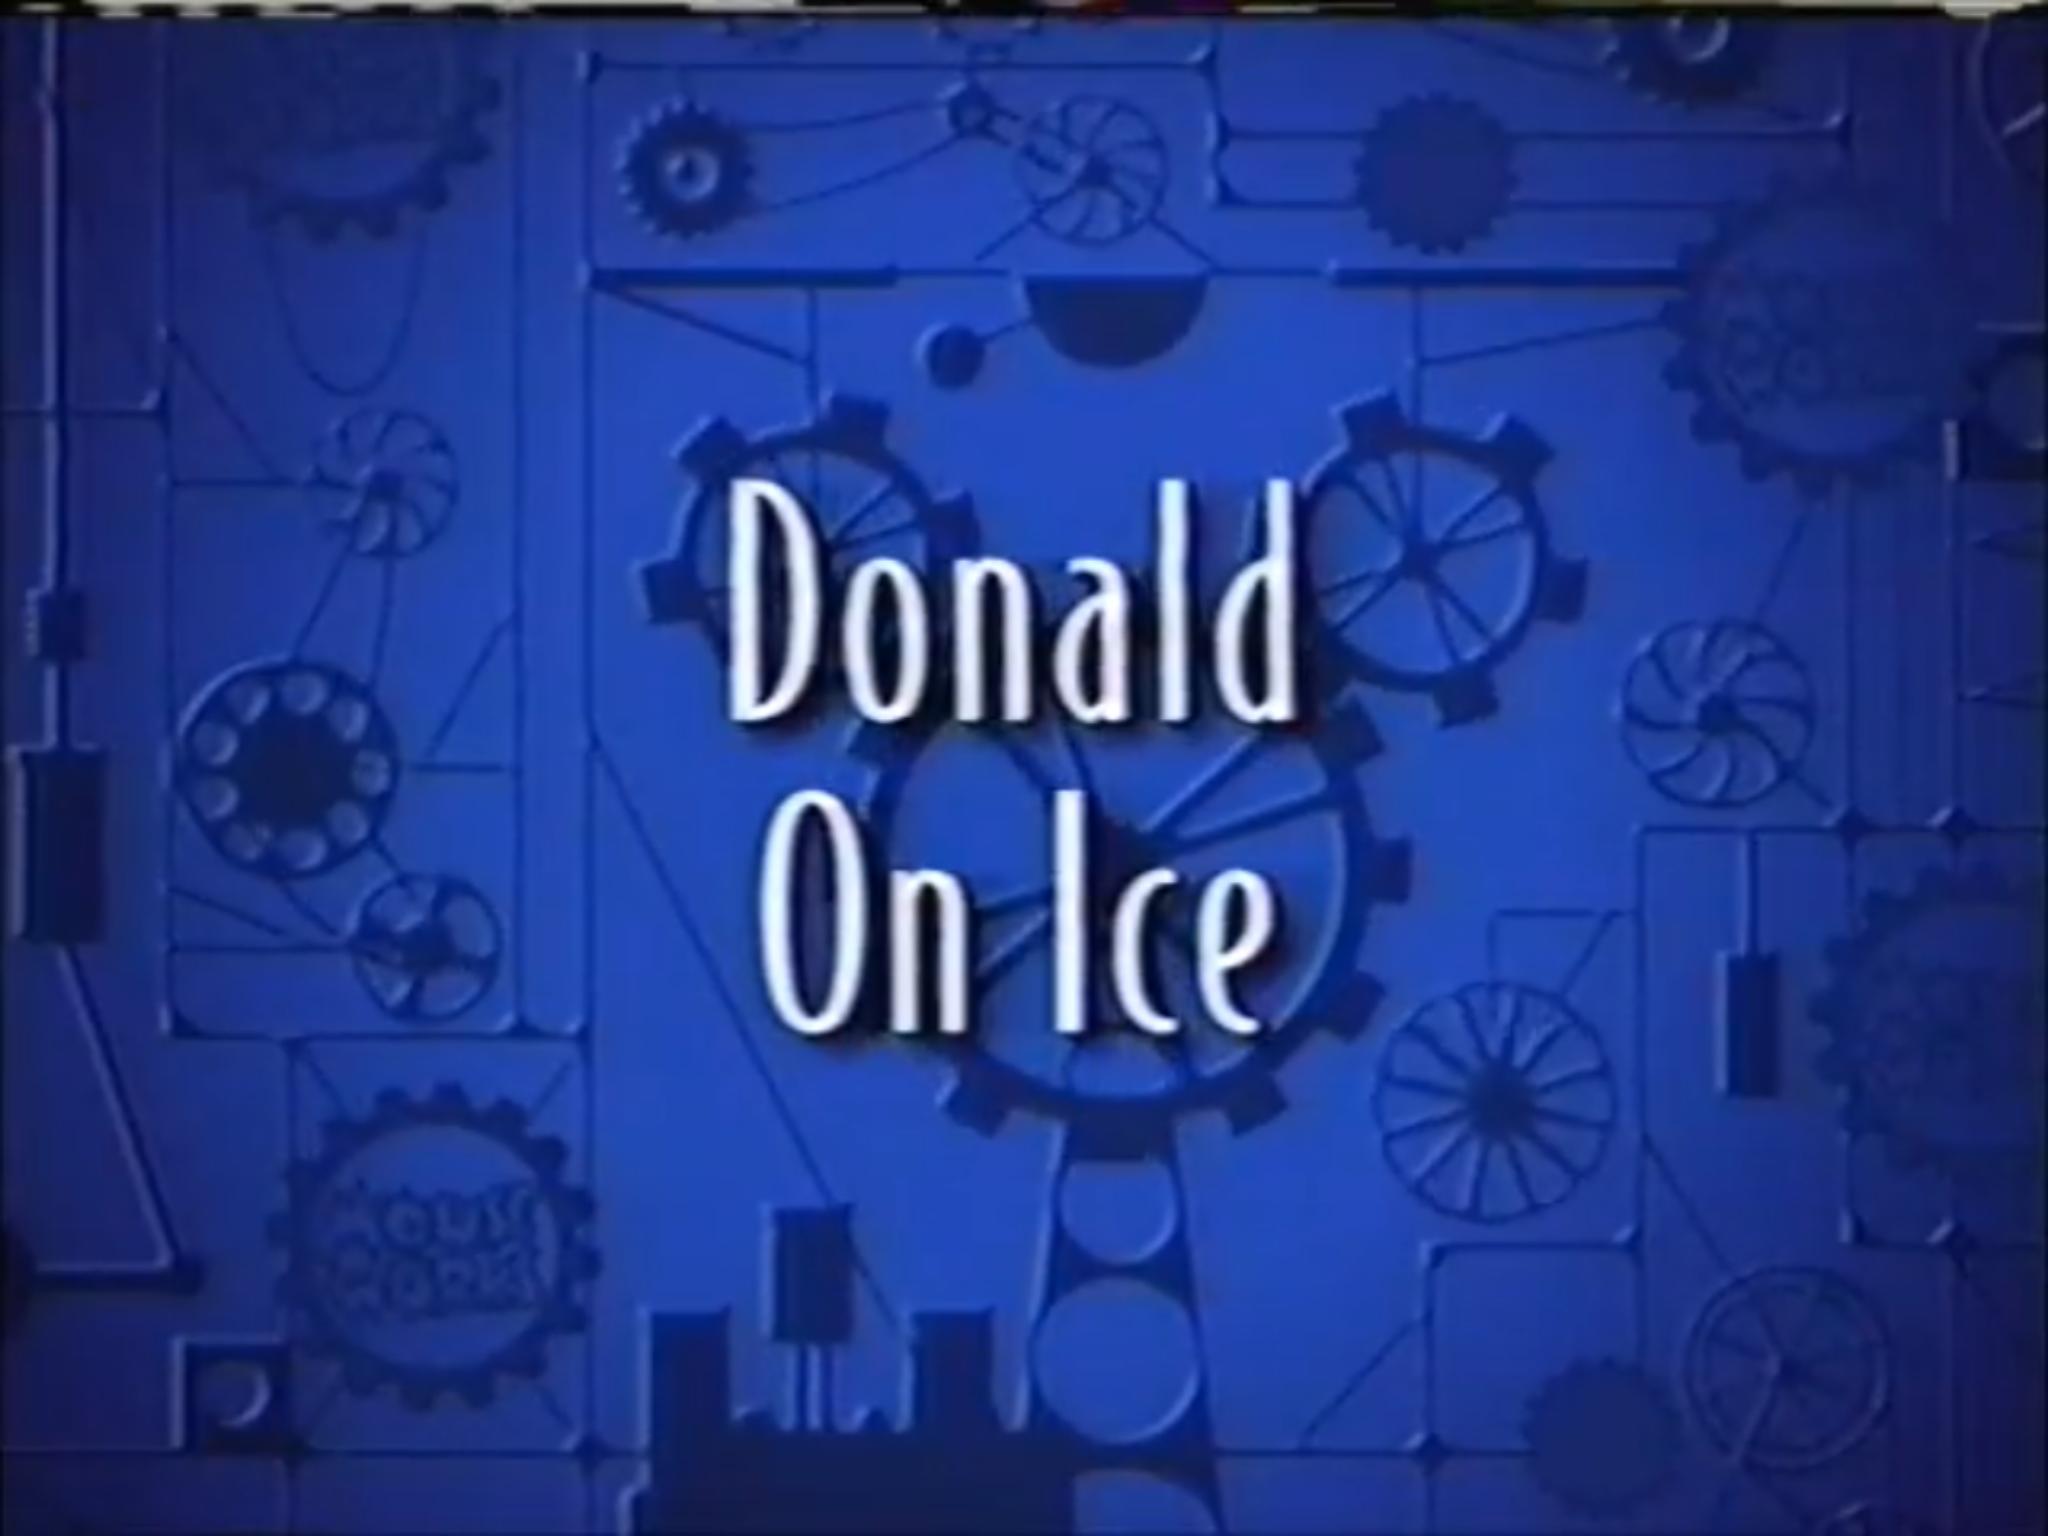 Donald on Ice